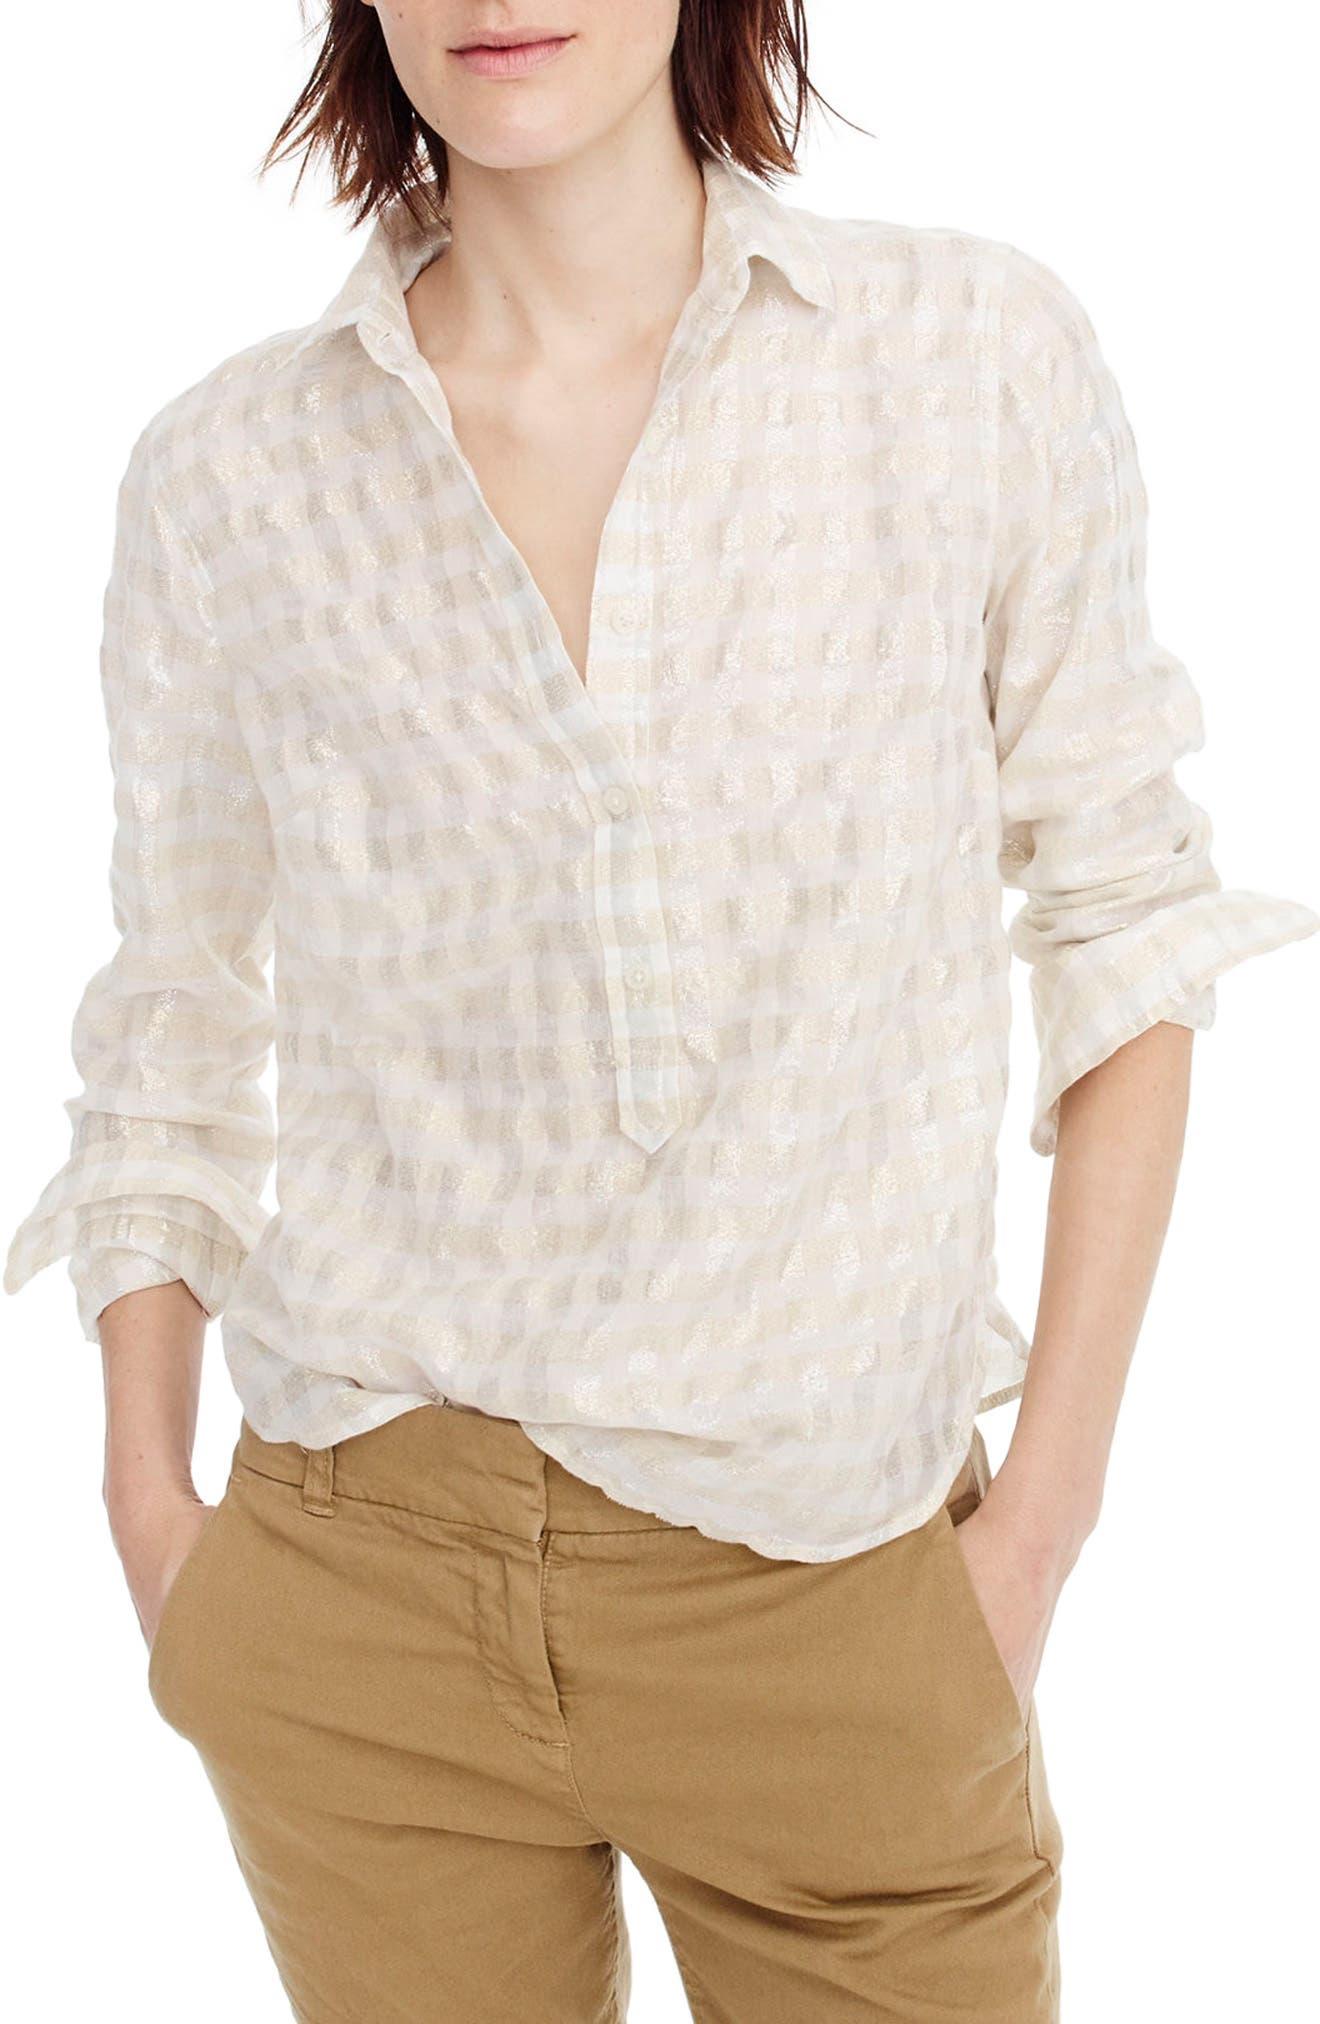 J.Crew Metallic Cotton Voile Popover Shirt (Regular & Petite)